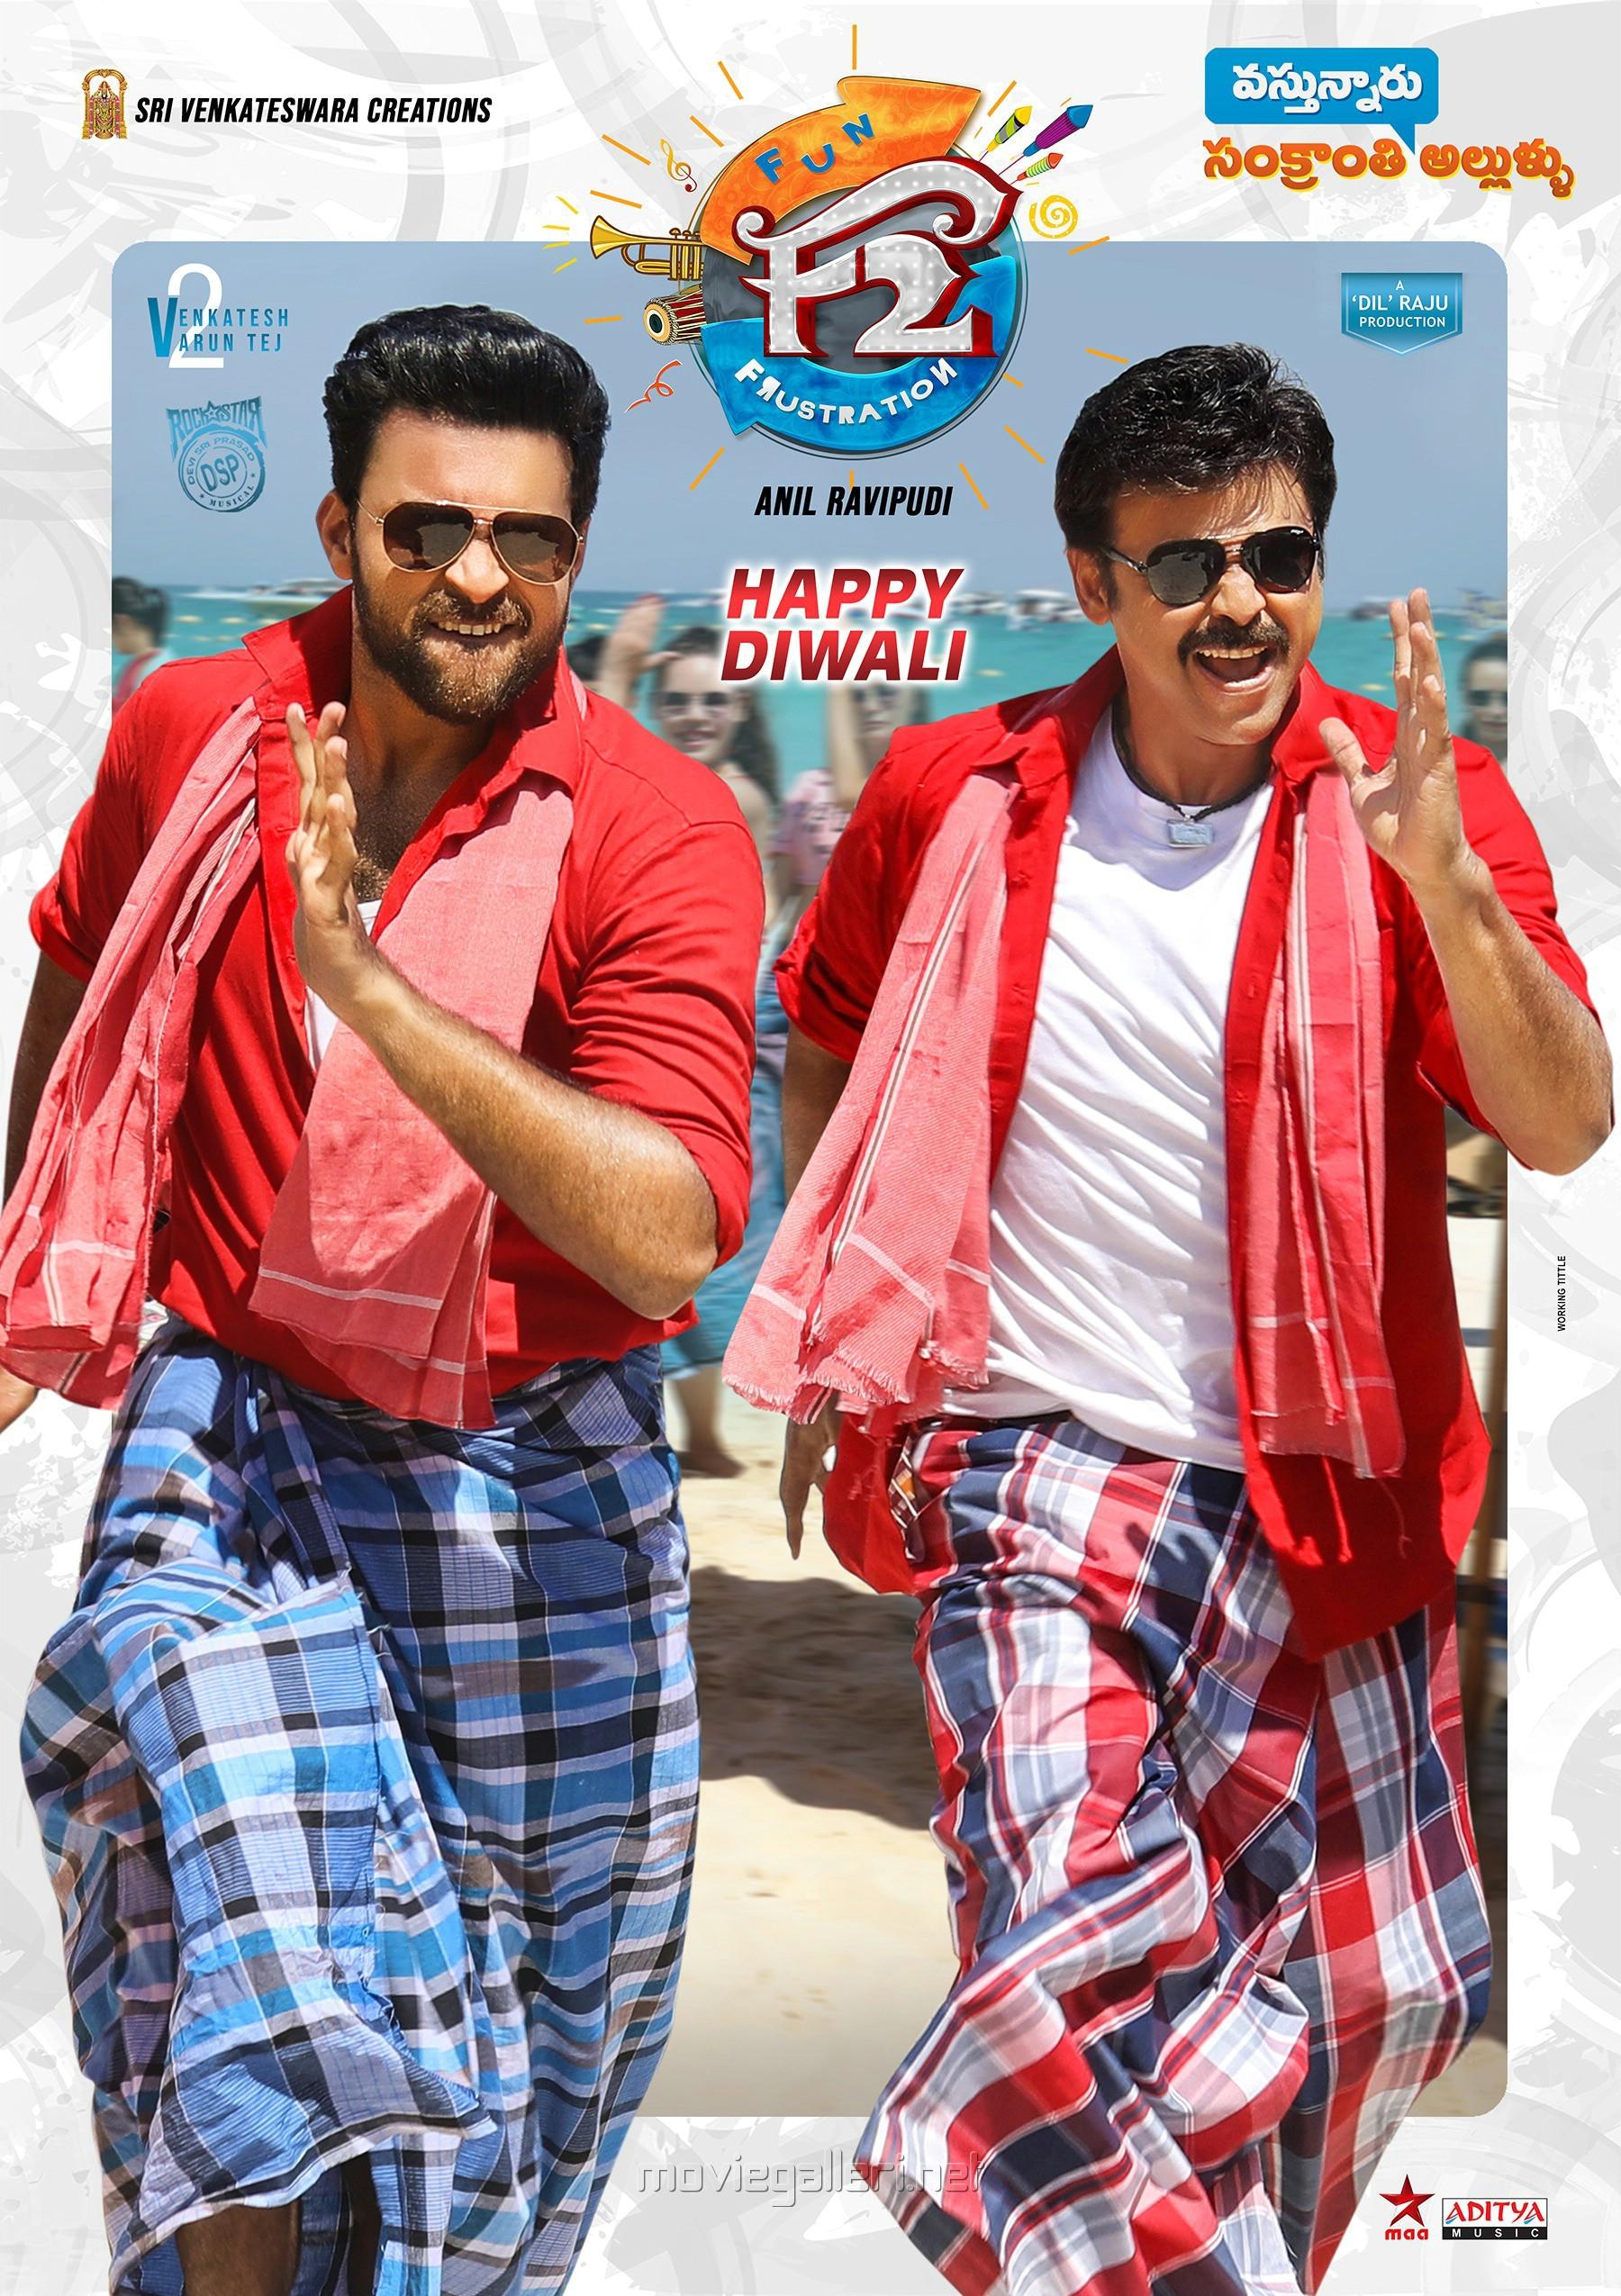 Venkatesh Varun Tej F2 Fun And Frustration Movie Diwali - F2 Movie Posters - HD Wallpaper